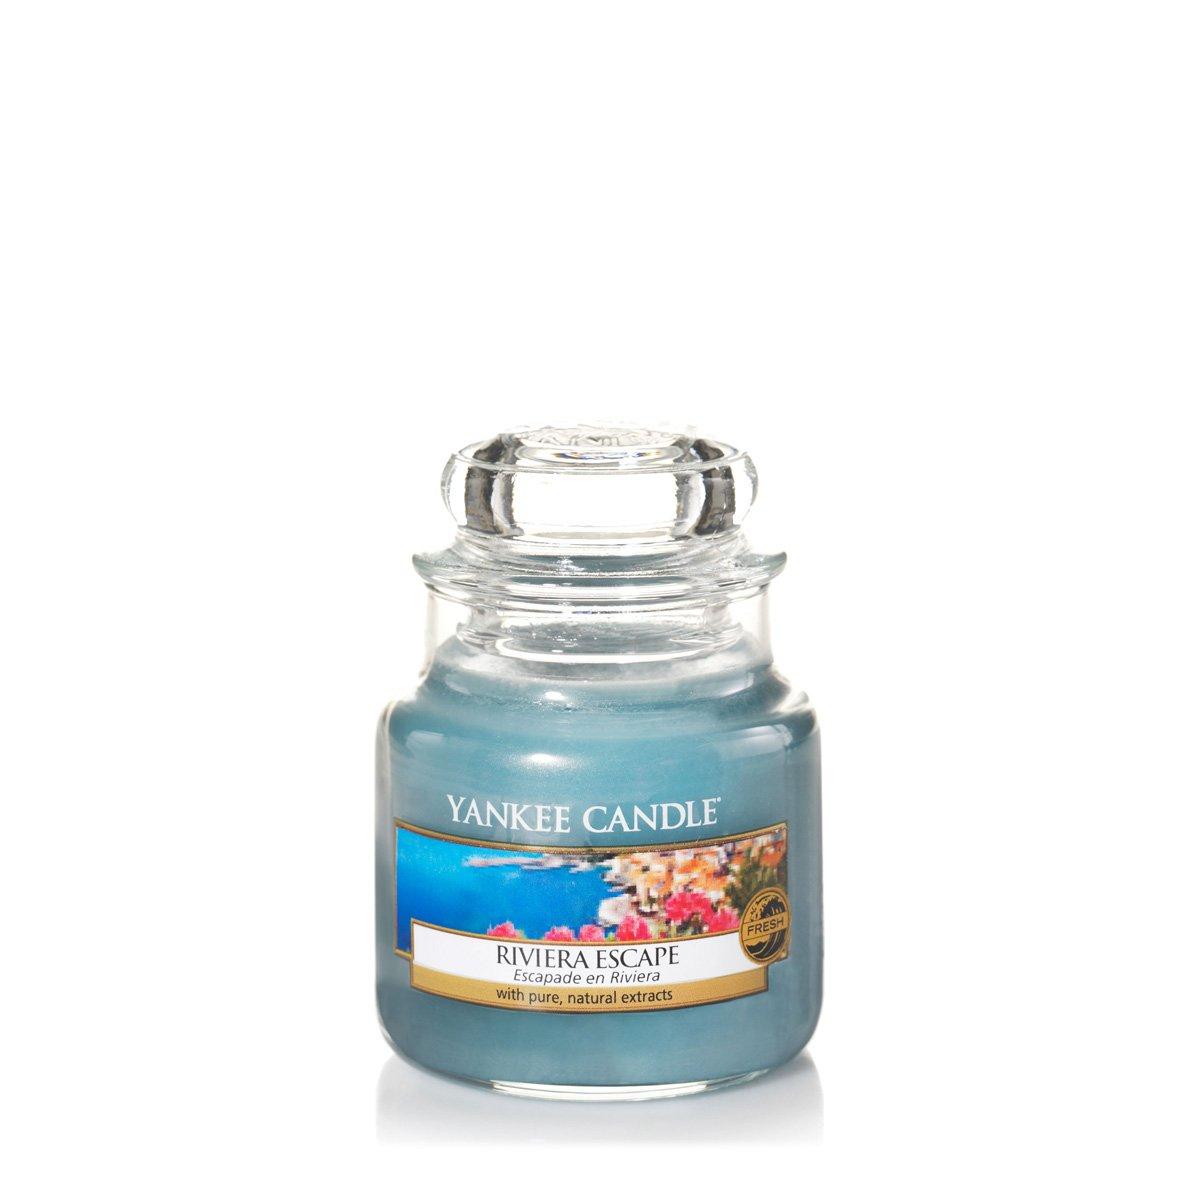 YANKEE CANDLE Riviera Escape Candele in Giara Piccola, Vetro, Blu, 6.3X6X5.5 cm 1507718E